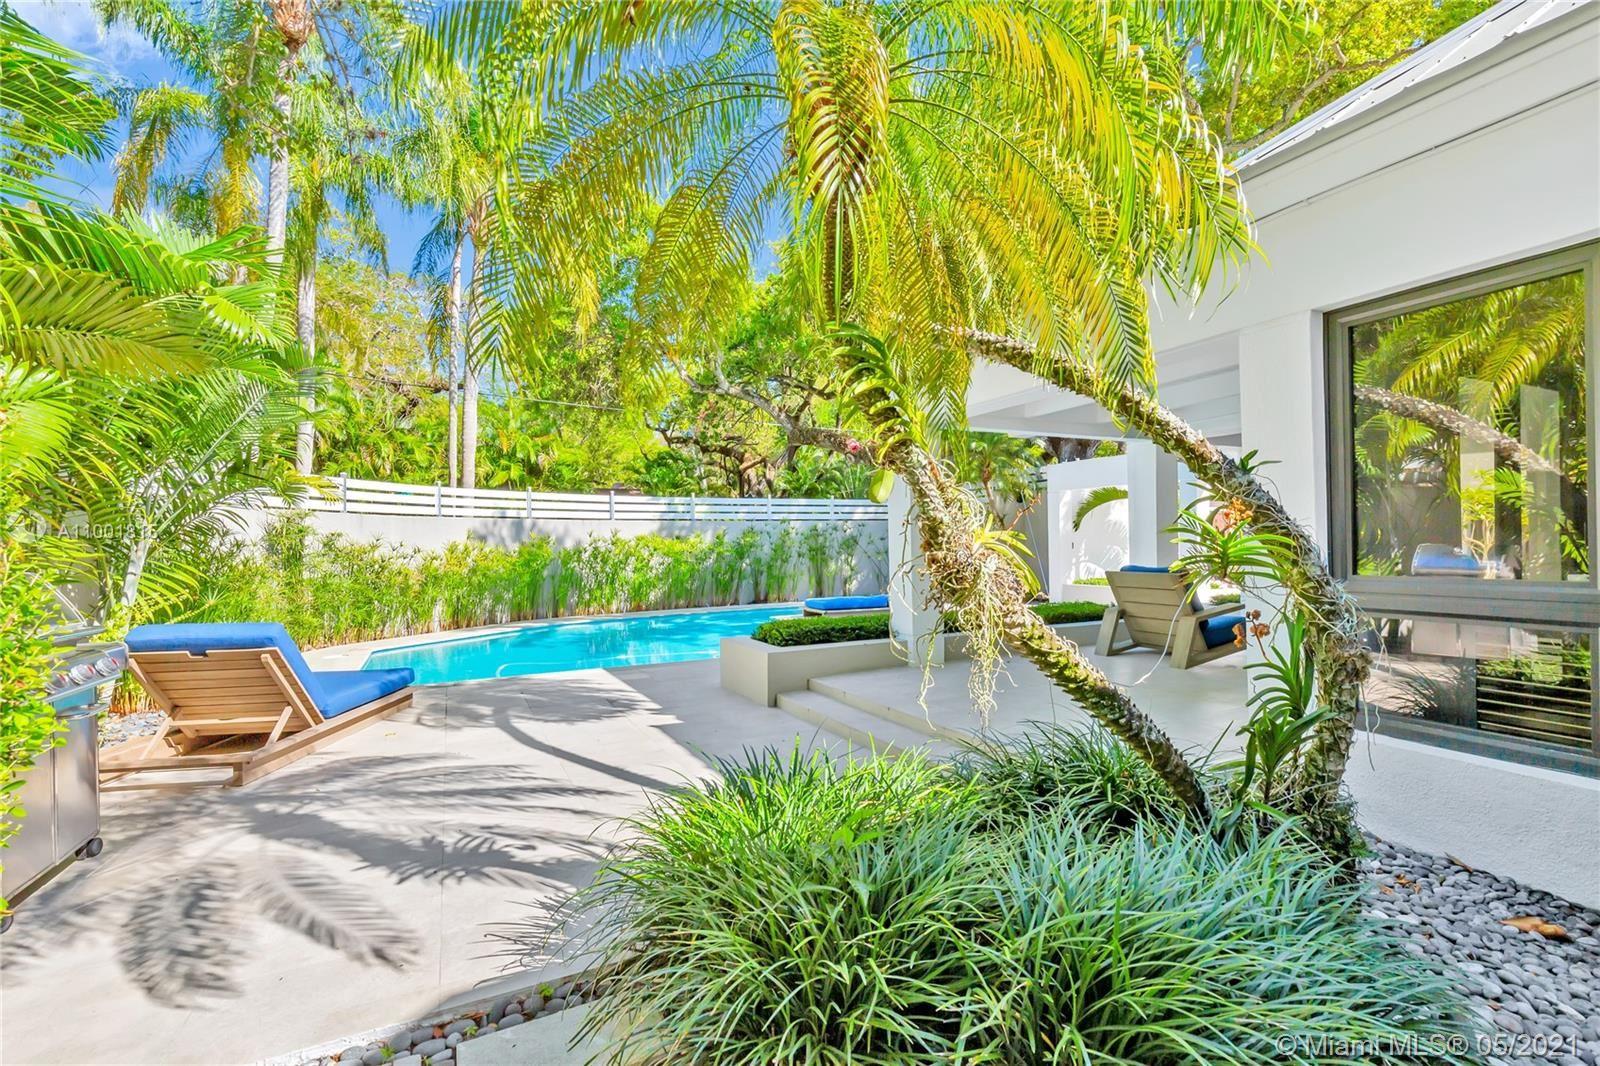 2800 Emathla St, Miami, FL 33133 - #: A11001815